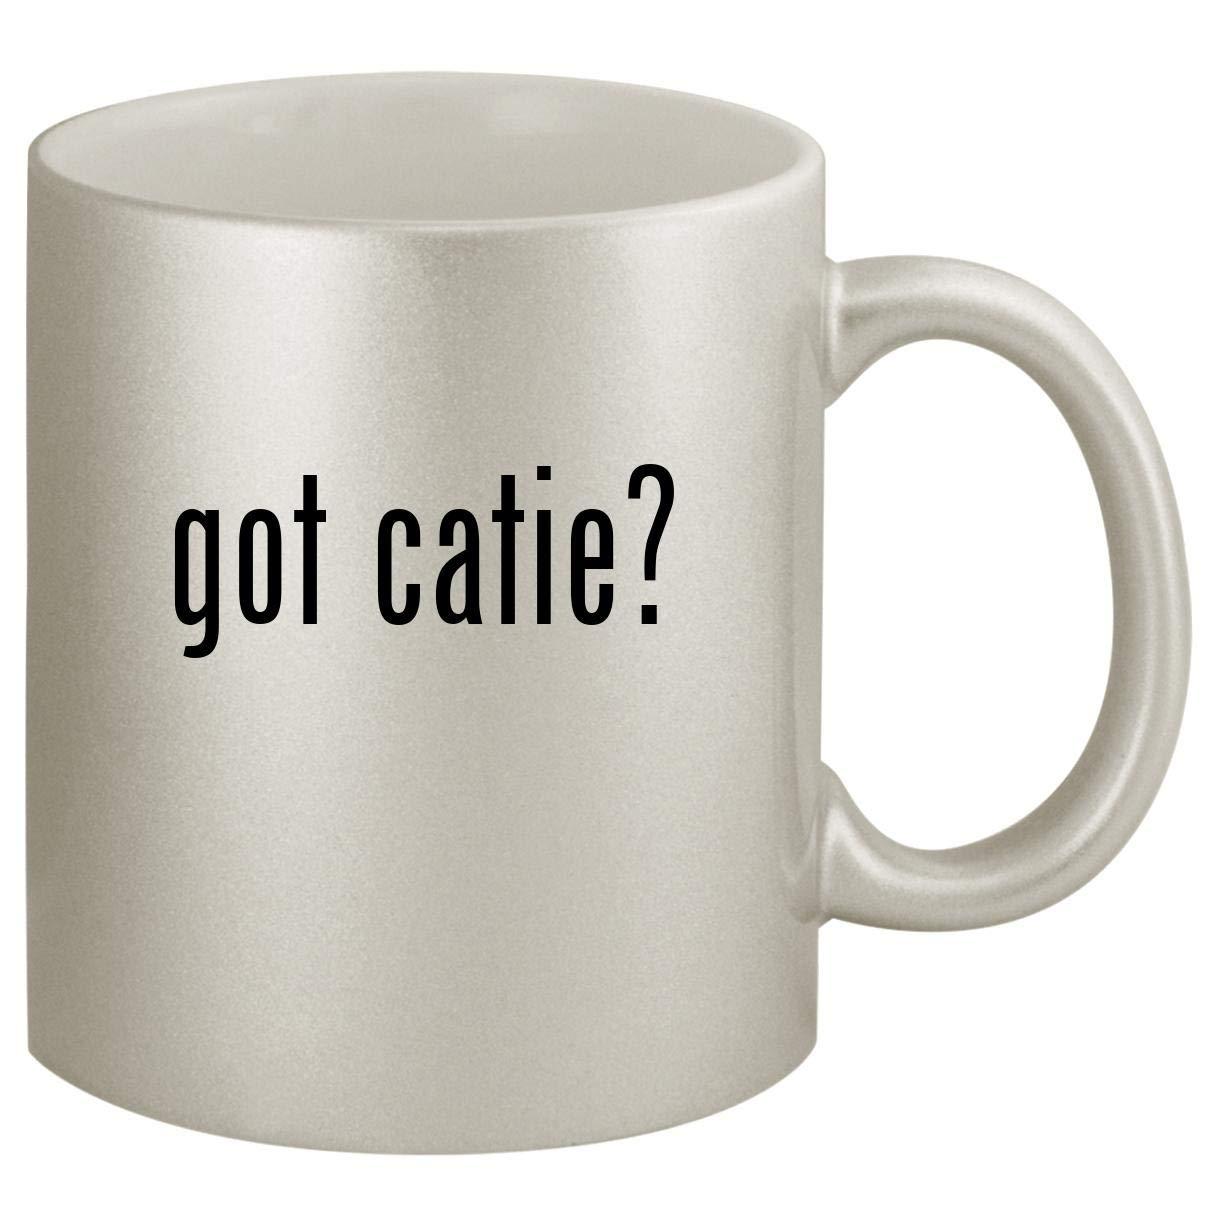 got catie? - Ceramic 11oz Silver Coffee Mug, Silver